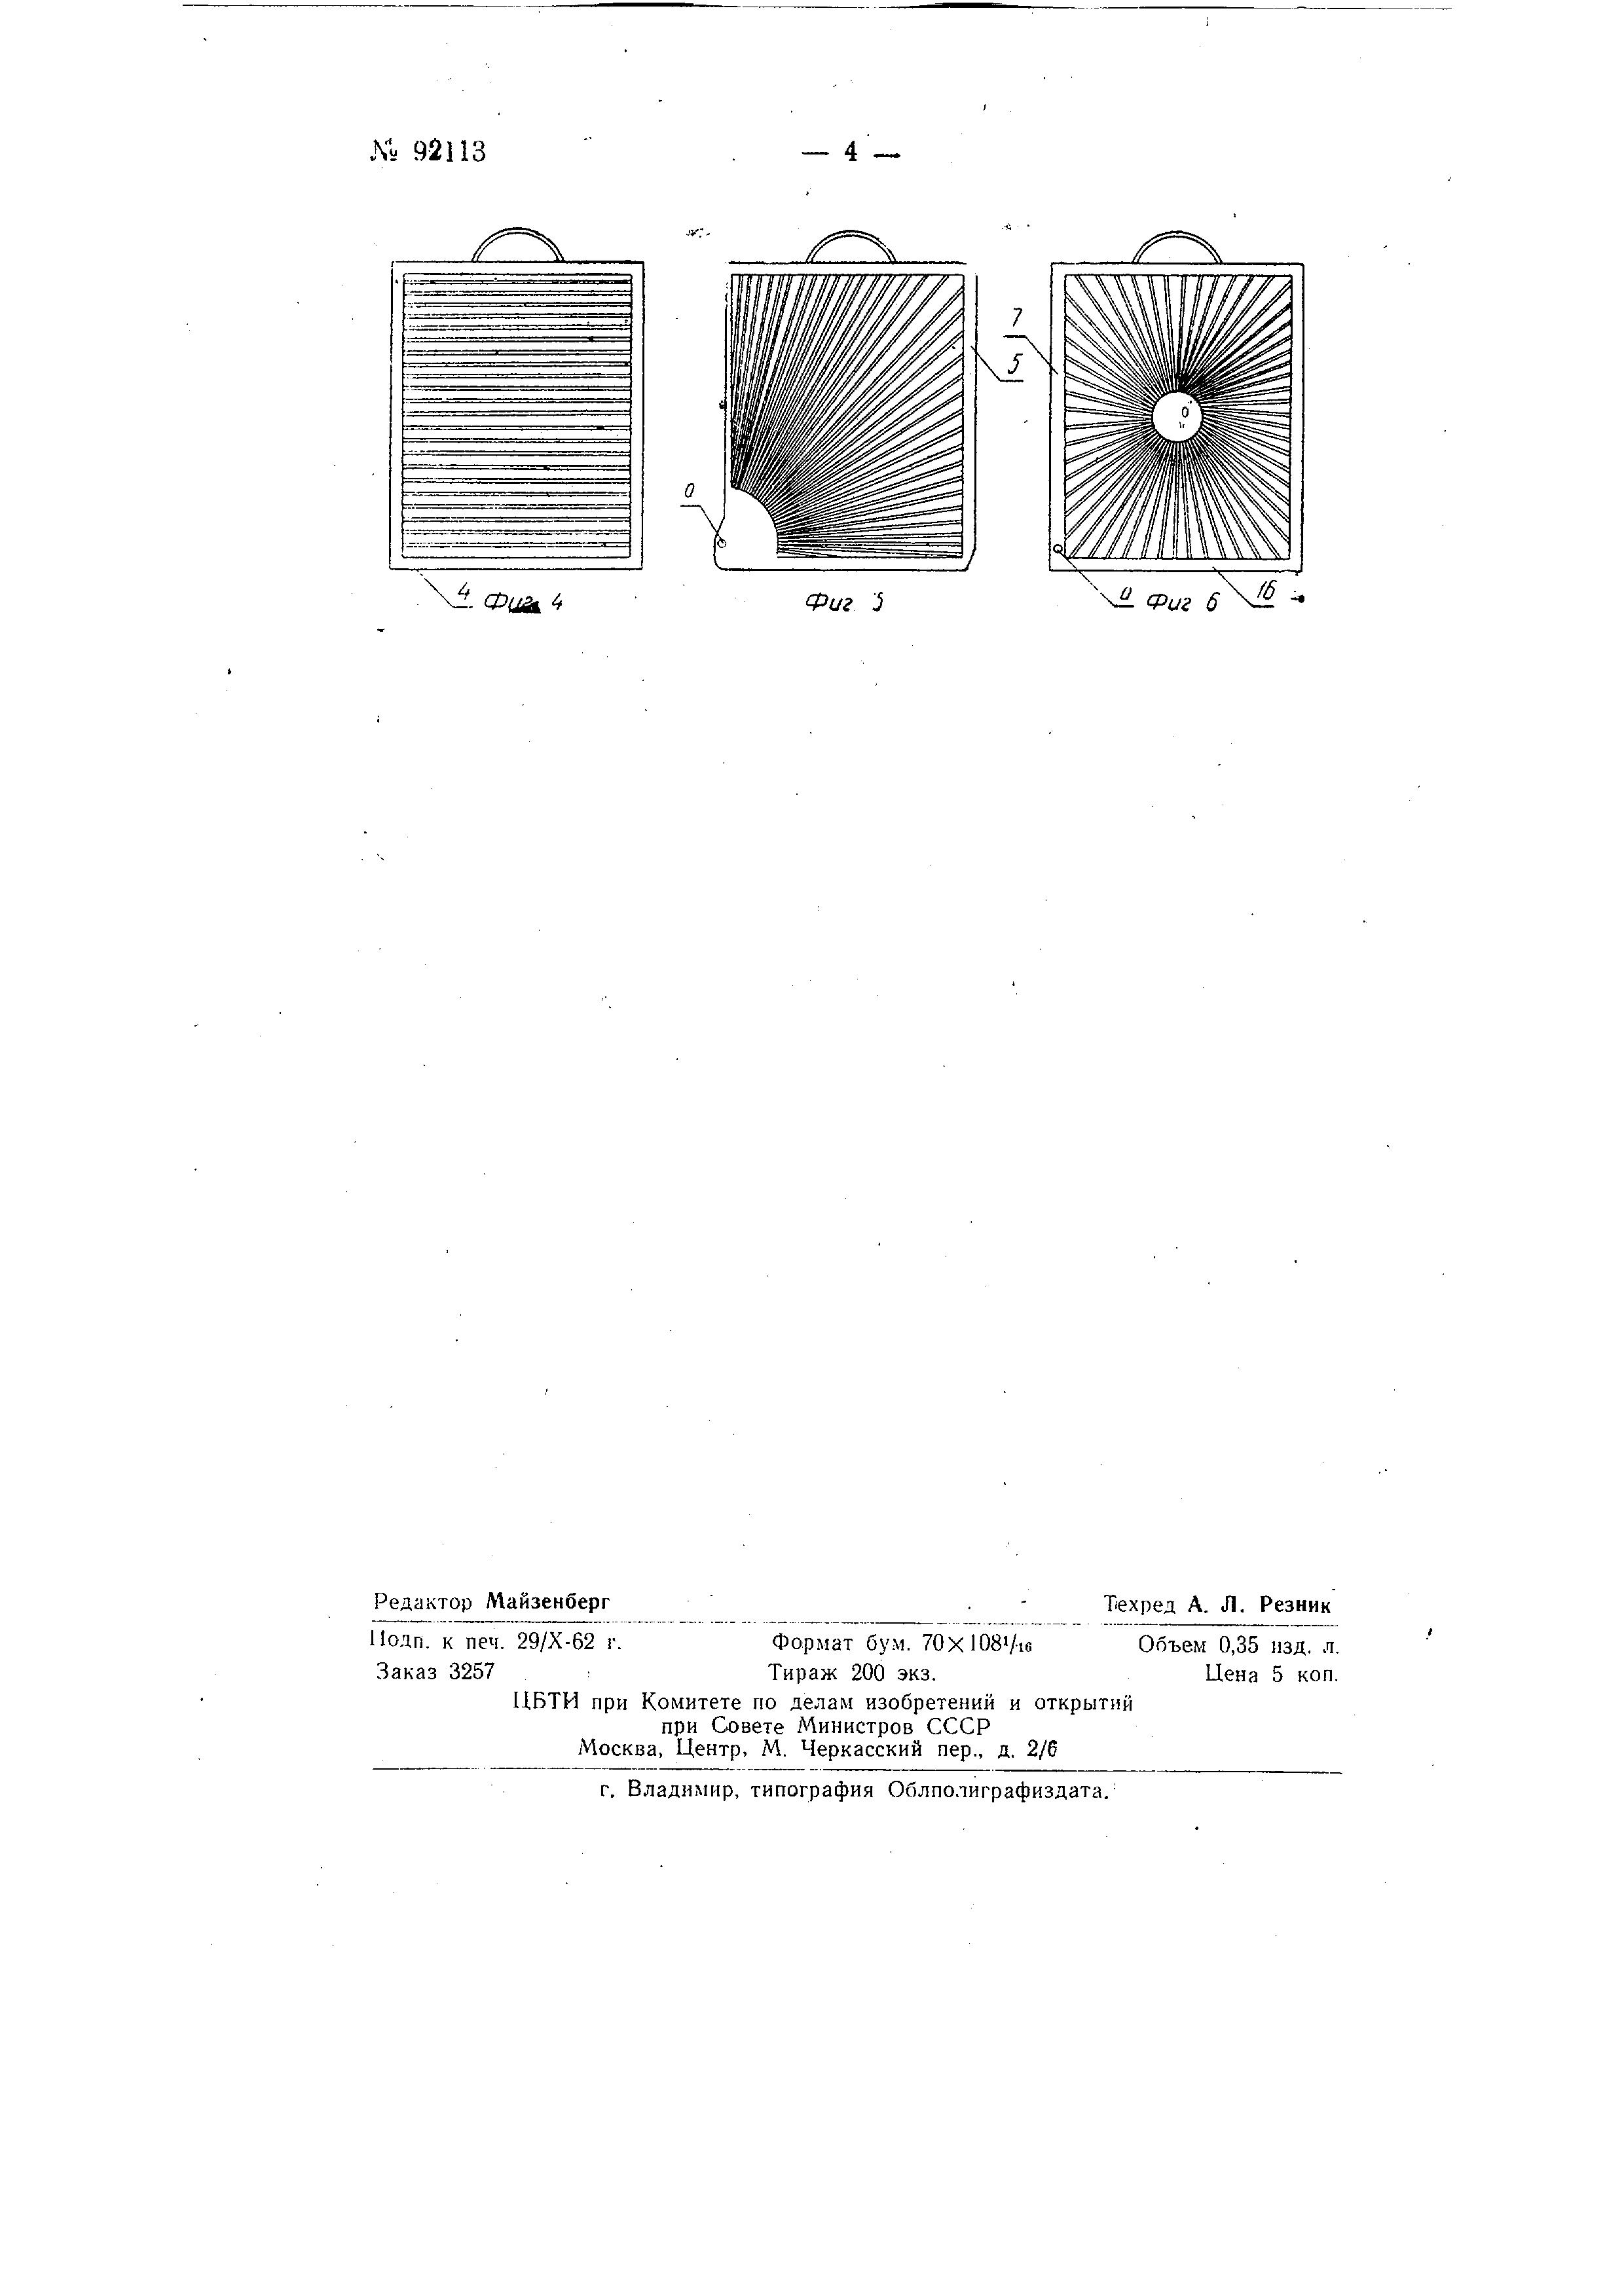 Кимограф